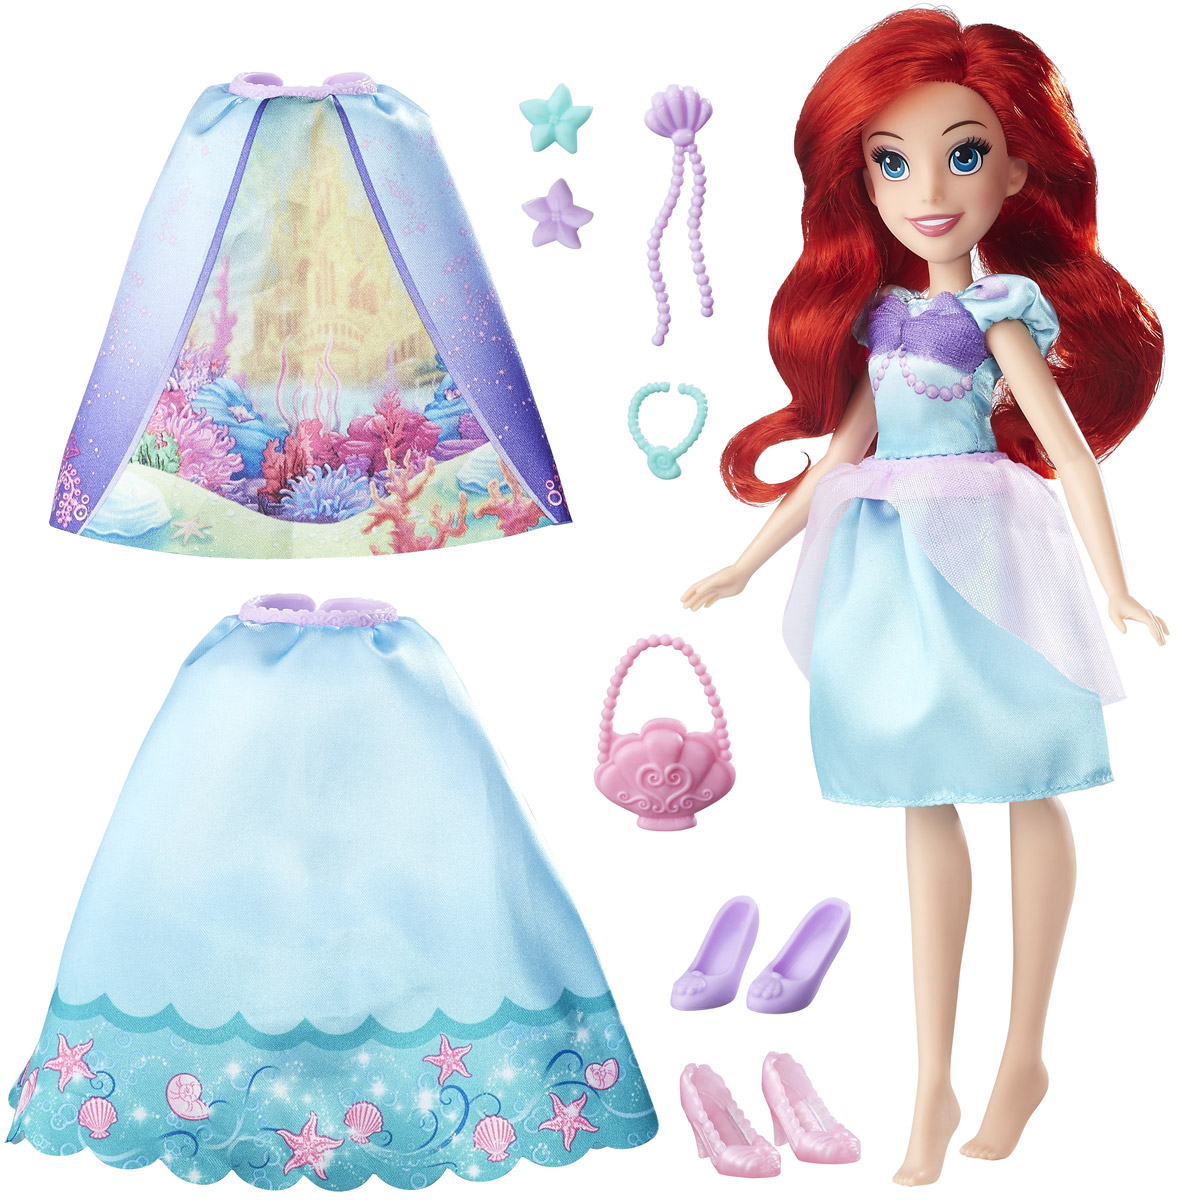 Disney Princess Кукла Ариэль Модница - Куклы и аксессуары